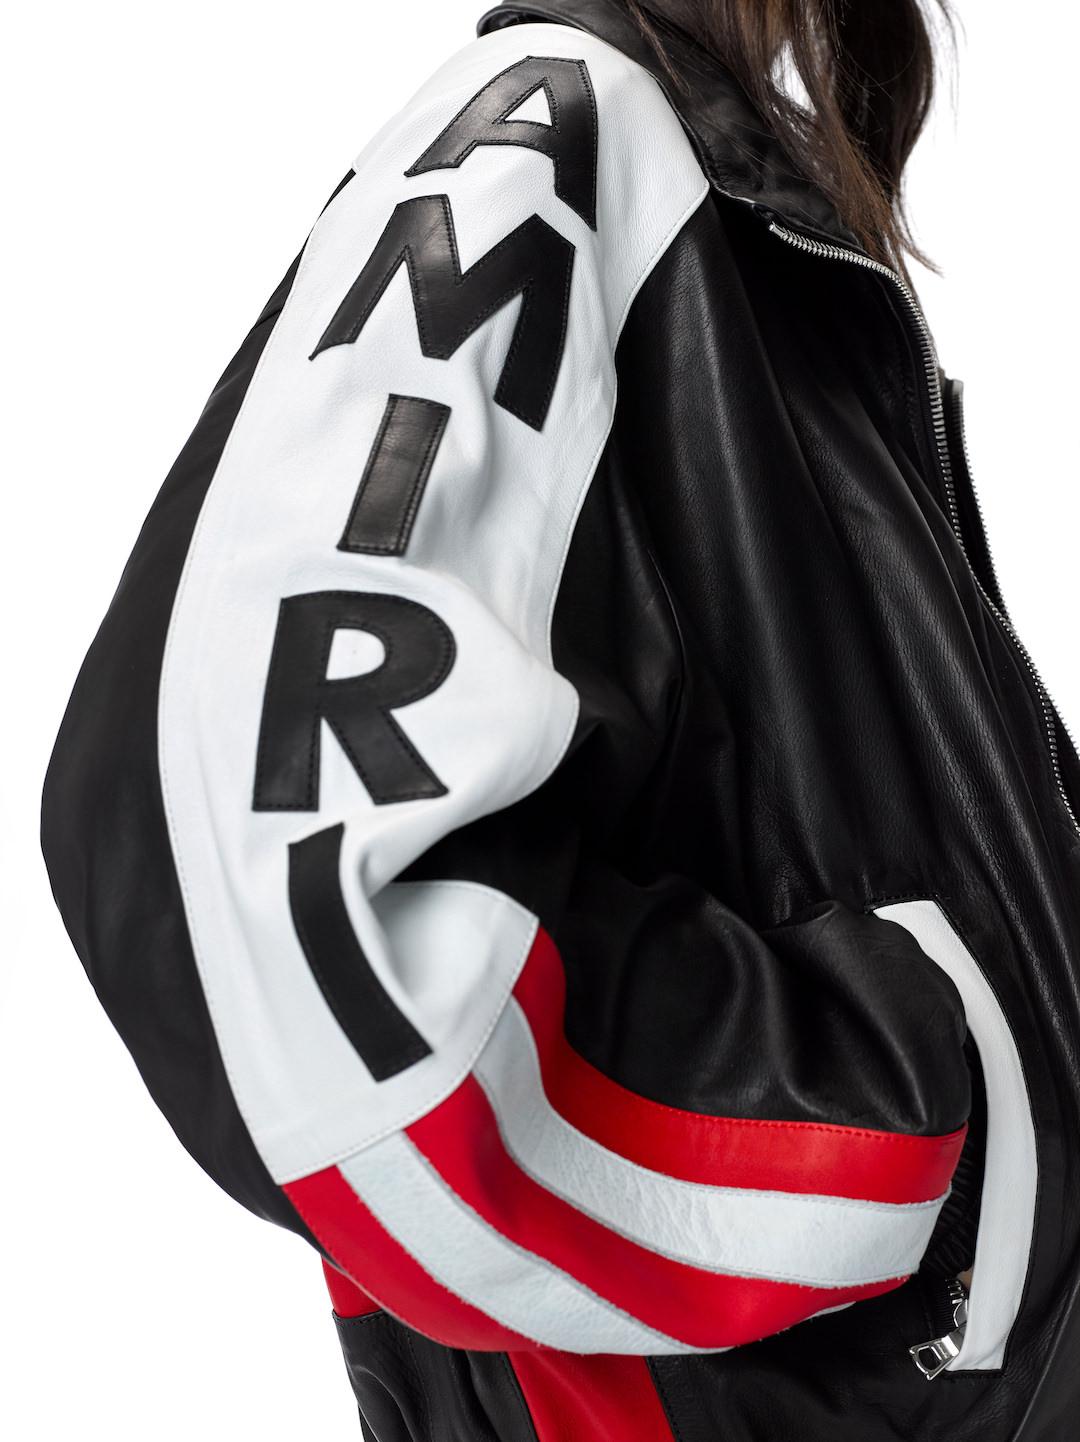 AMIRI SS19 WOMENS ECOMM_MAUS_7 AMIRI FLAG LEATHER BOMBER BLACK.265307 copy 2.jpg